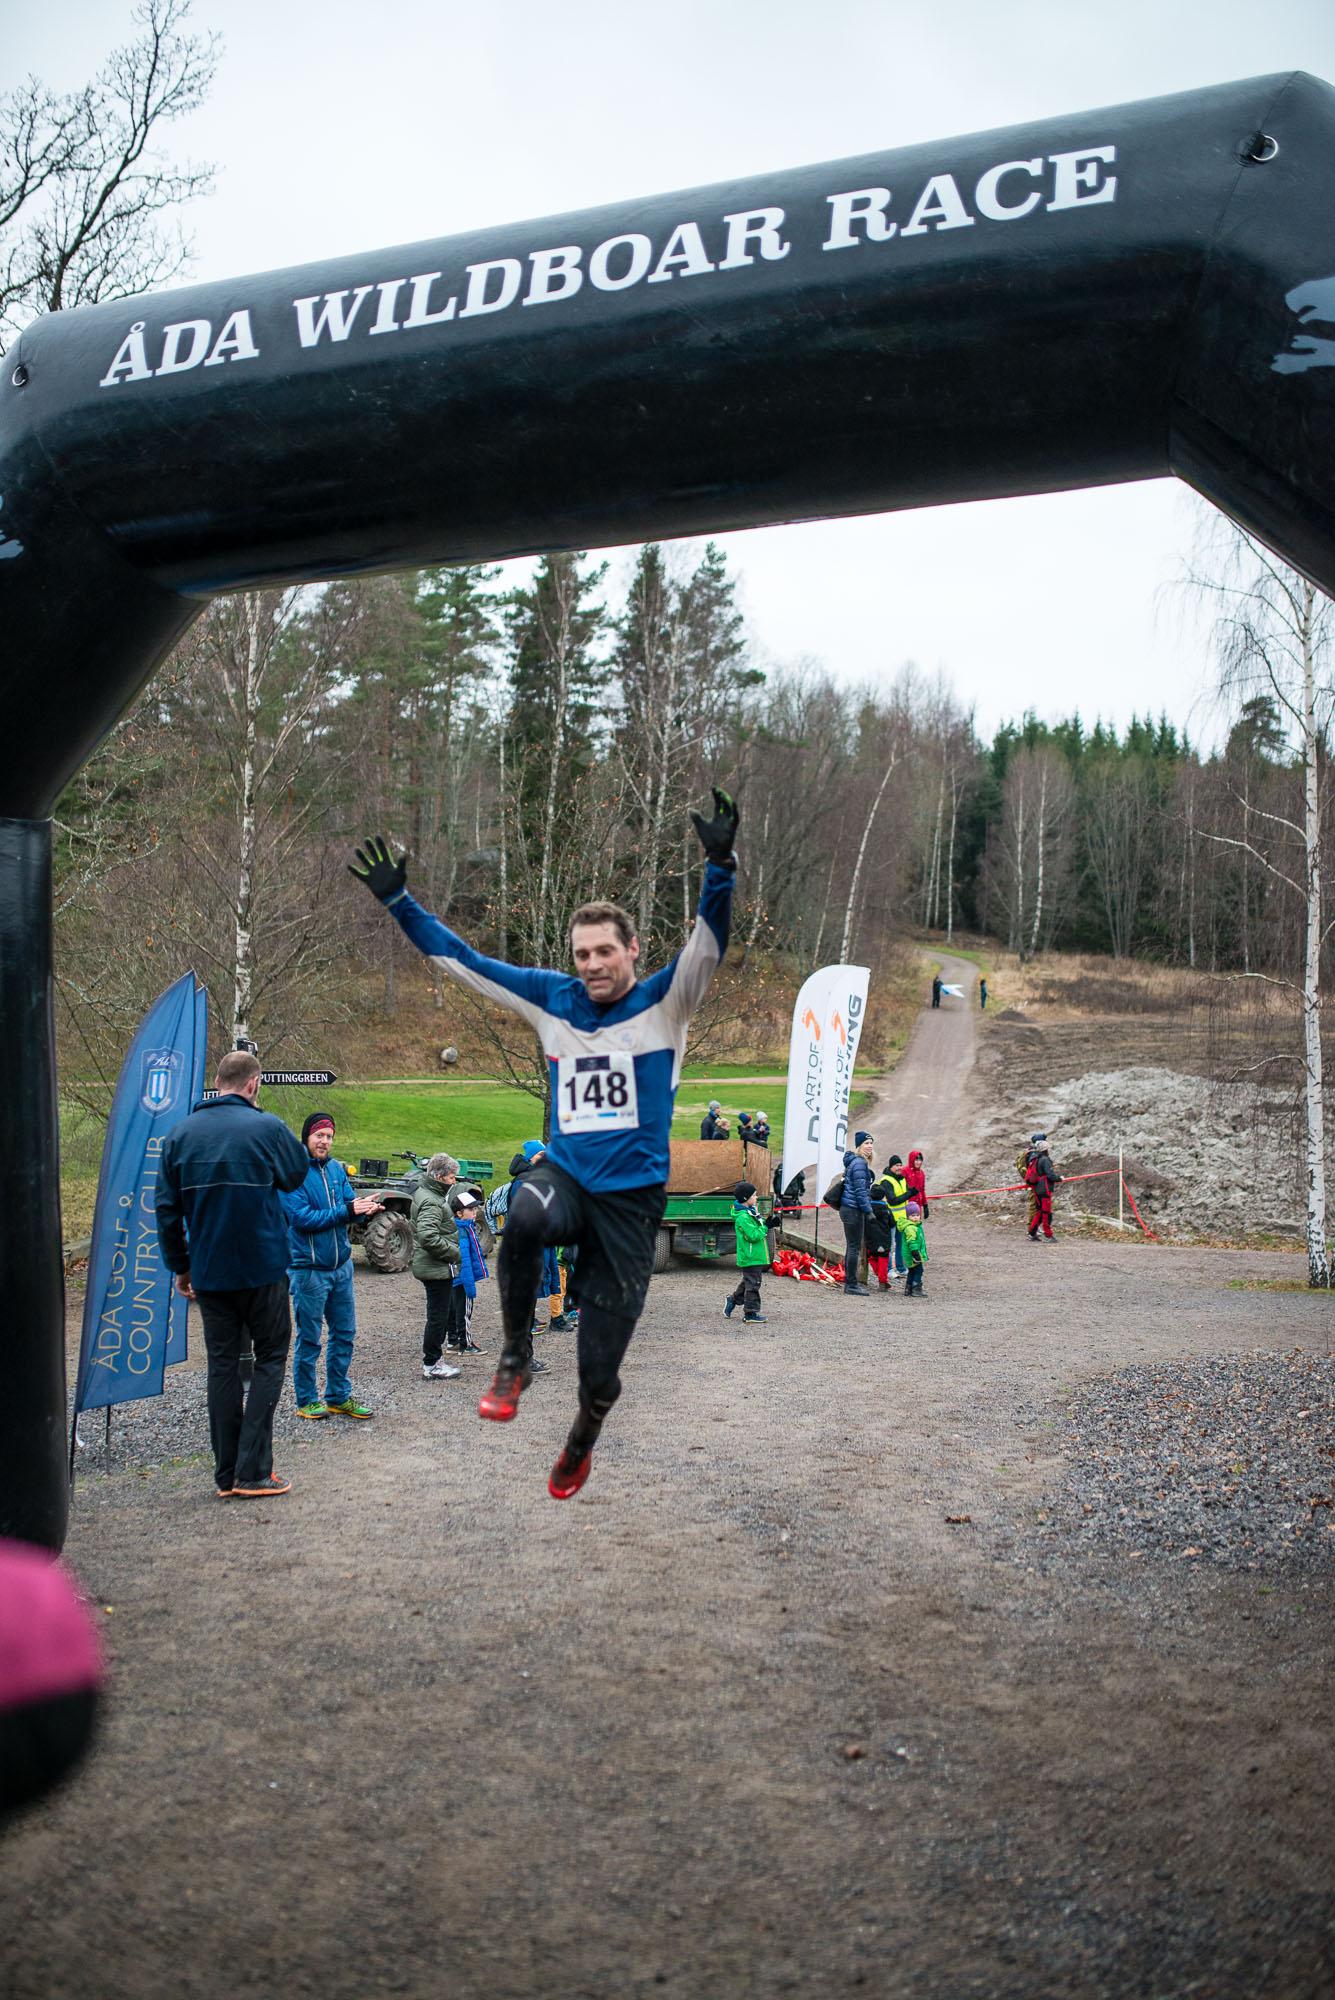 Åda Wild Boar Race 2014